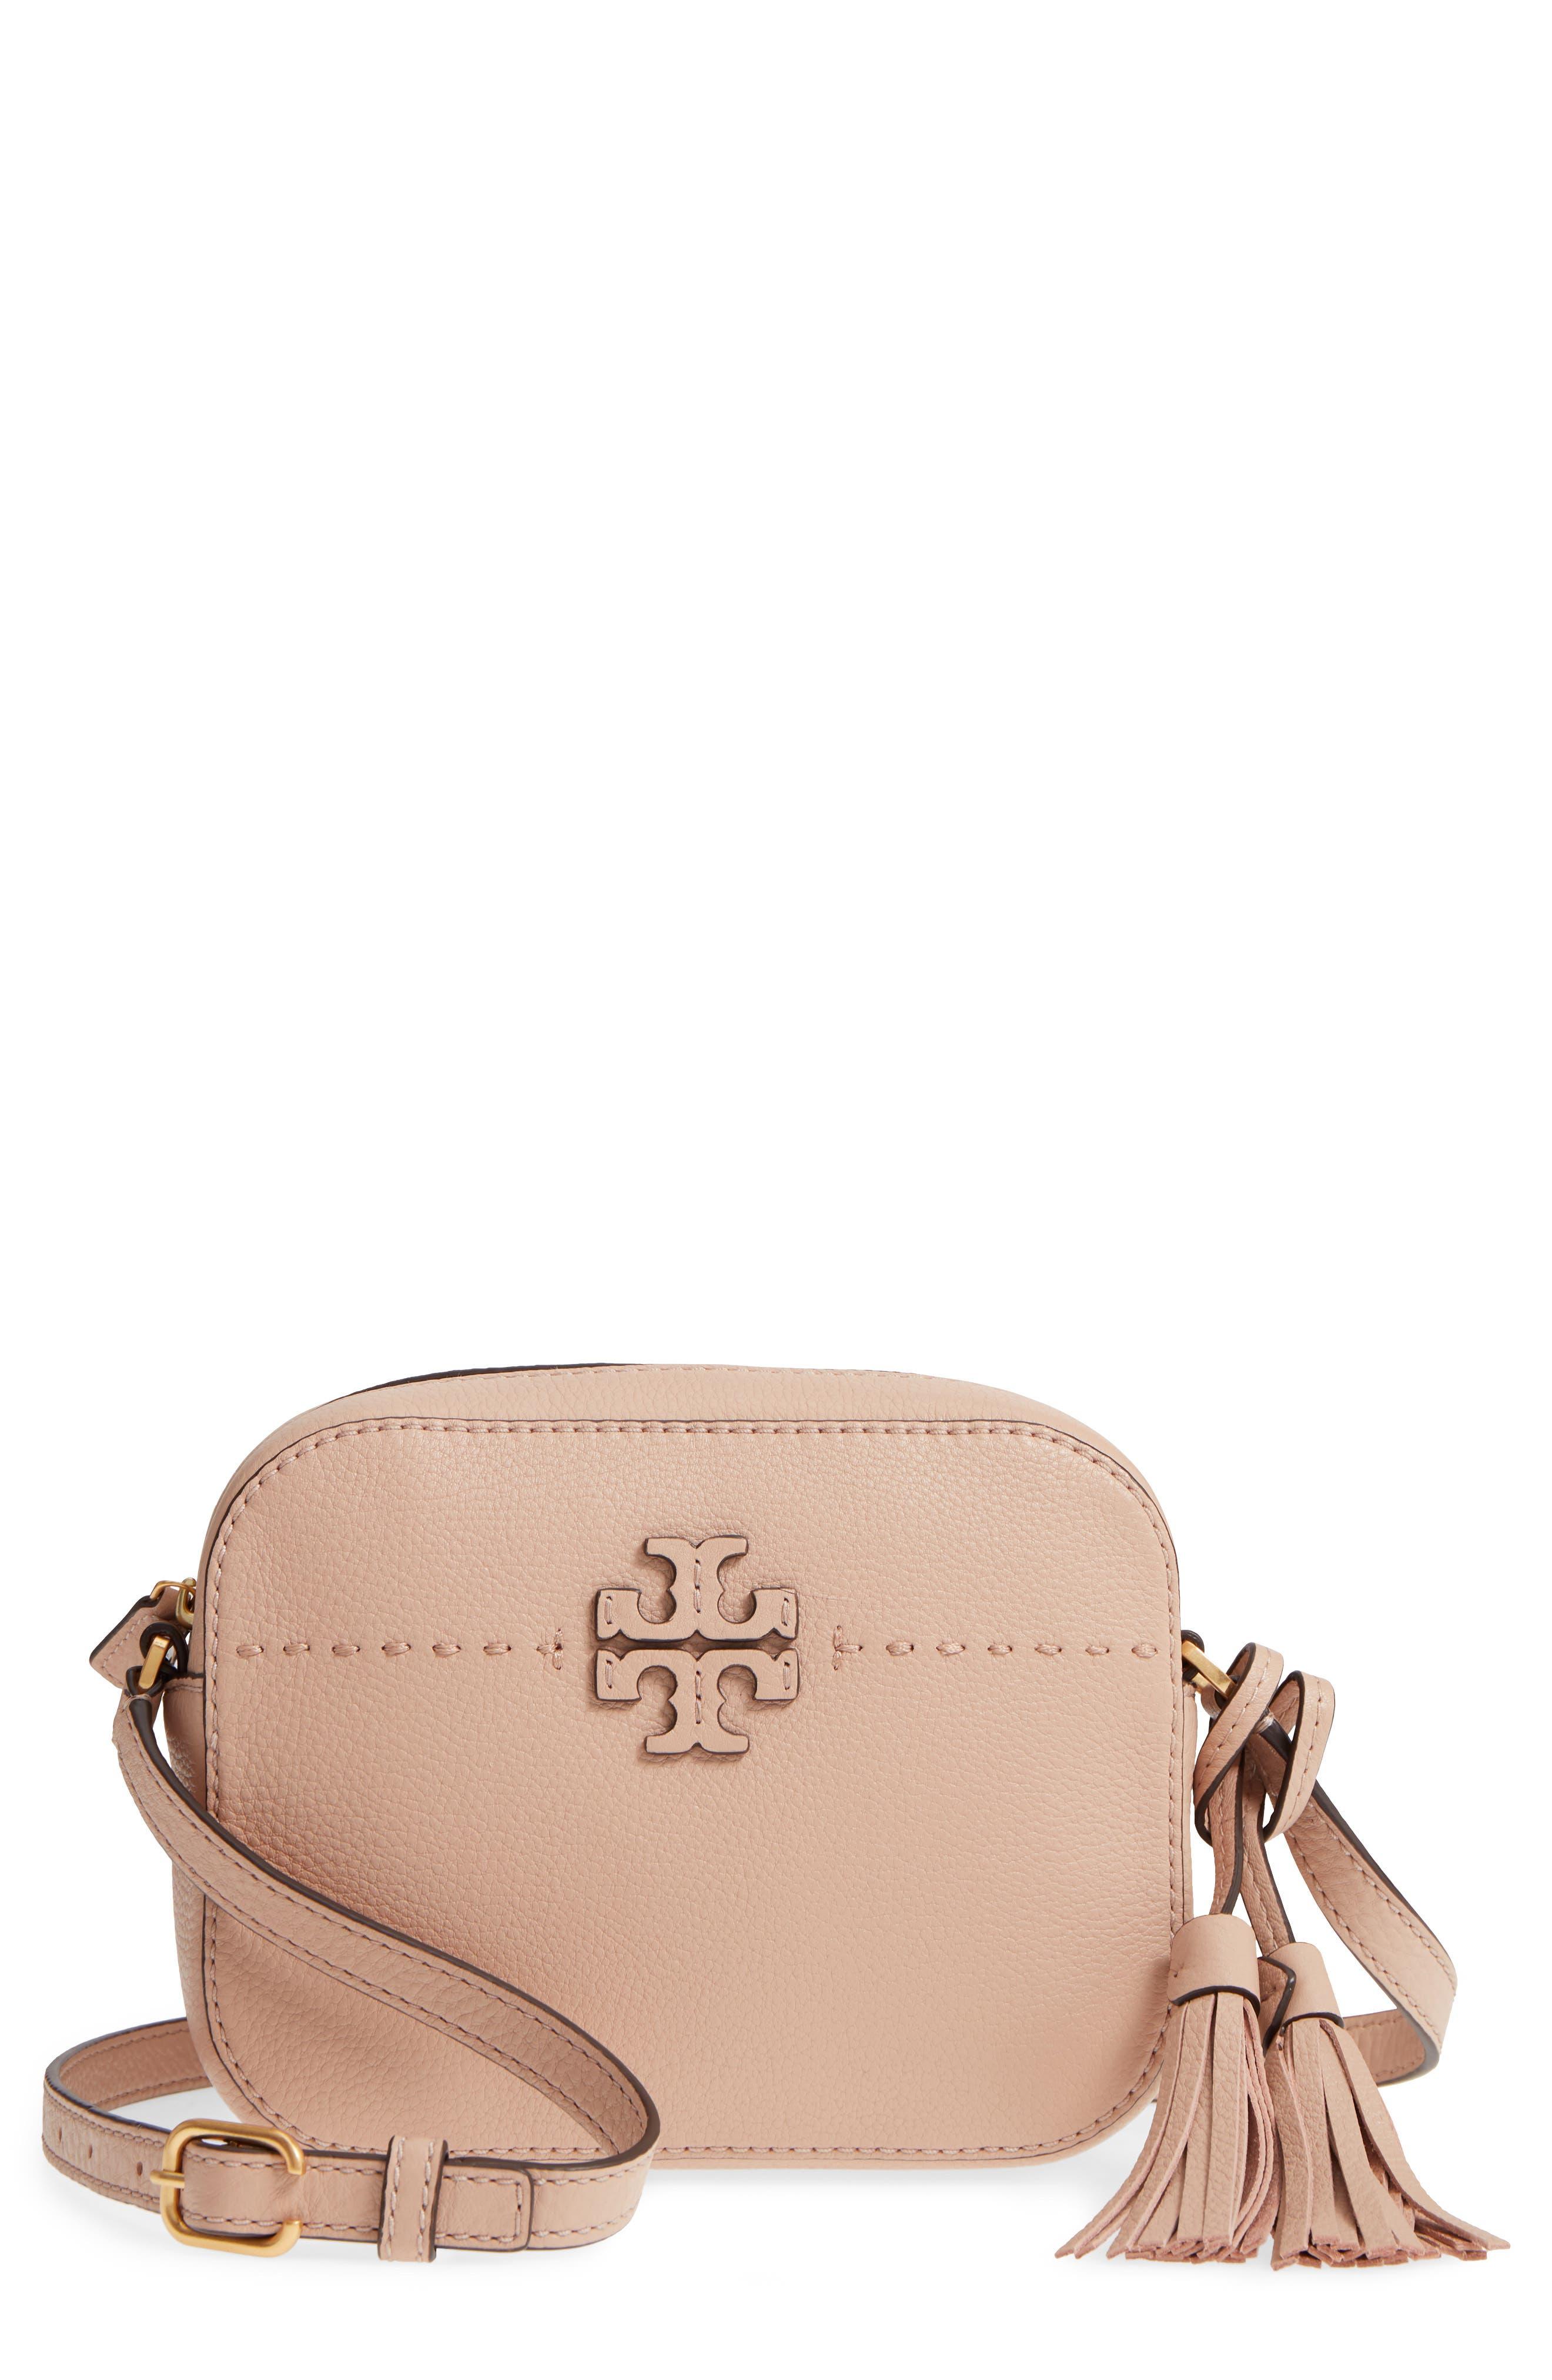 McGraw Leather Camera Bag,                         Main,                         color, DEVON SAND